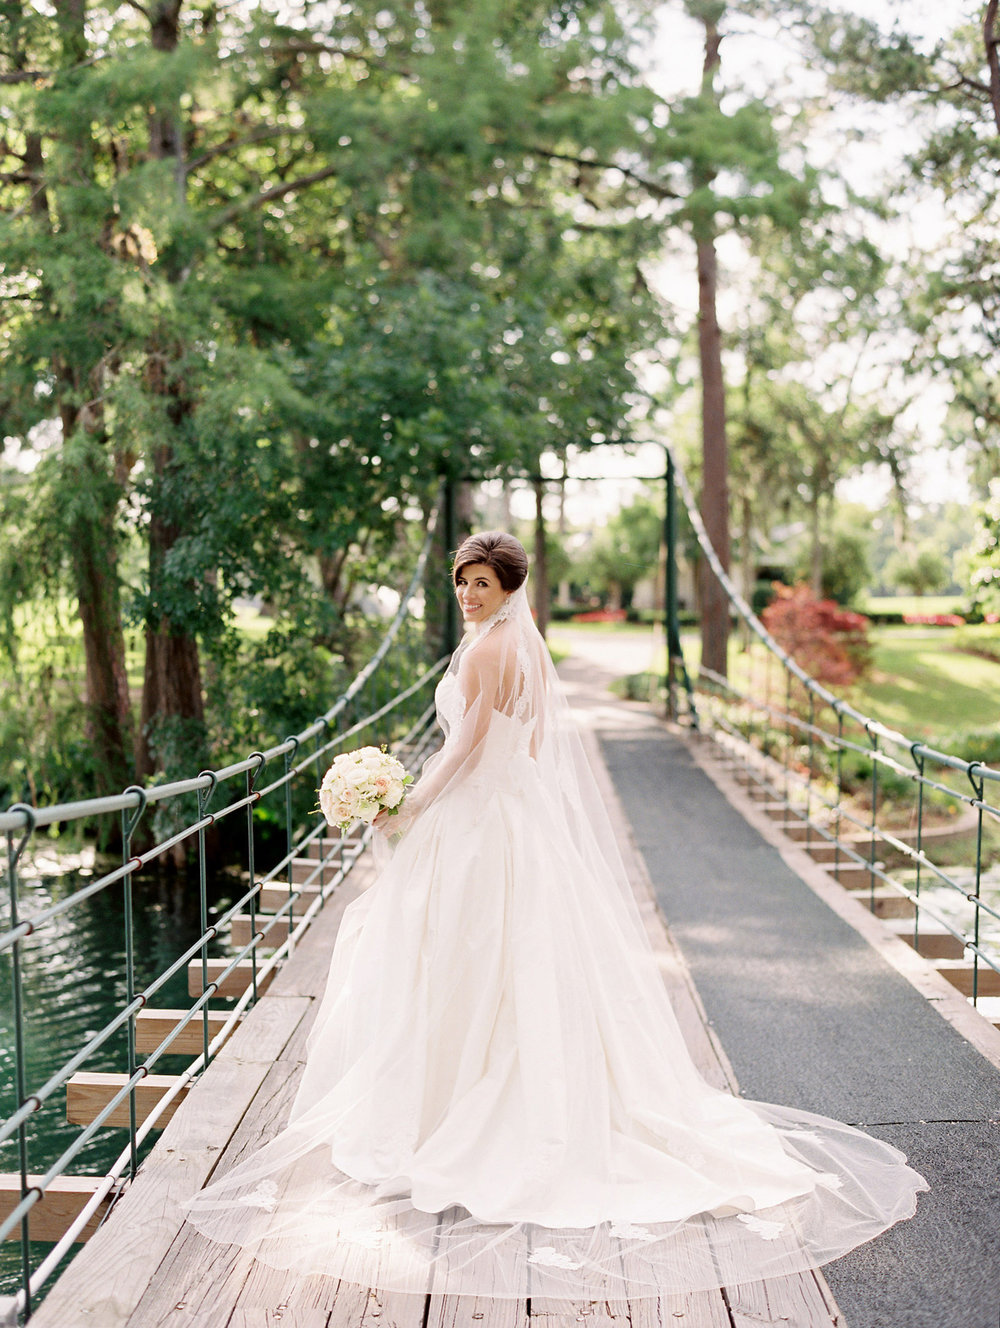 0021_0013_Houston-Lakeside-Country-Club-Film-Bridal-Photographer.jpg